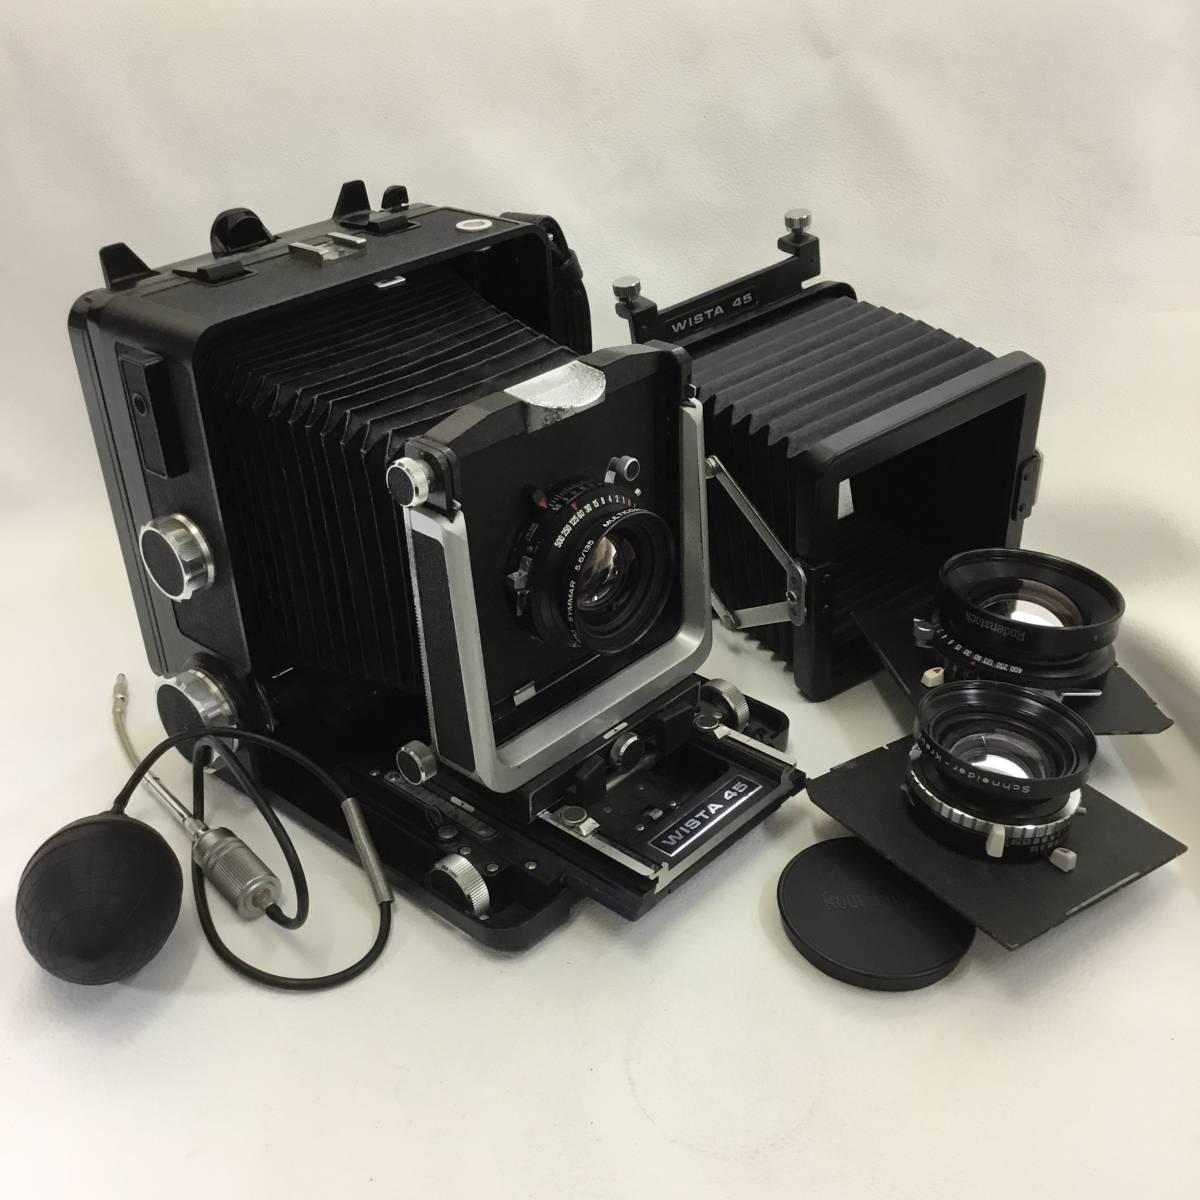 WISTA 45 ウィスタ45 レンズ 付属品セット 大判カメラ